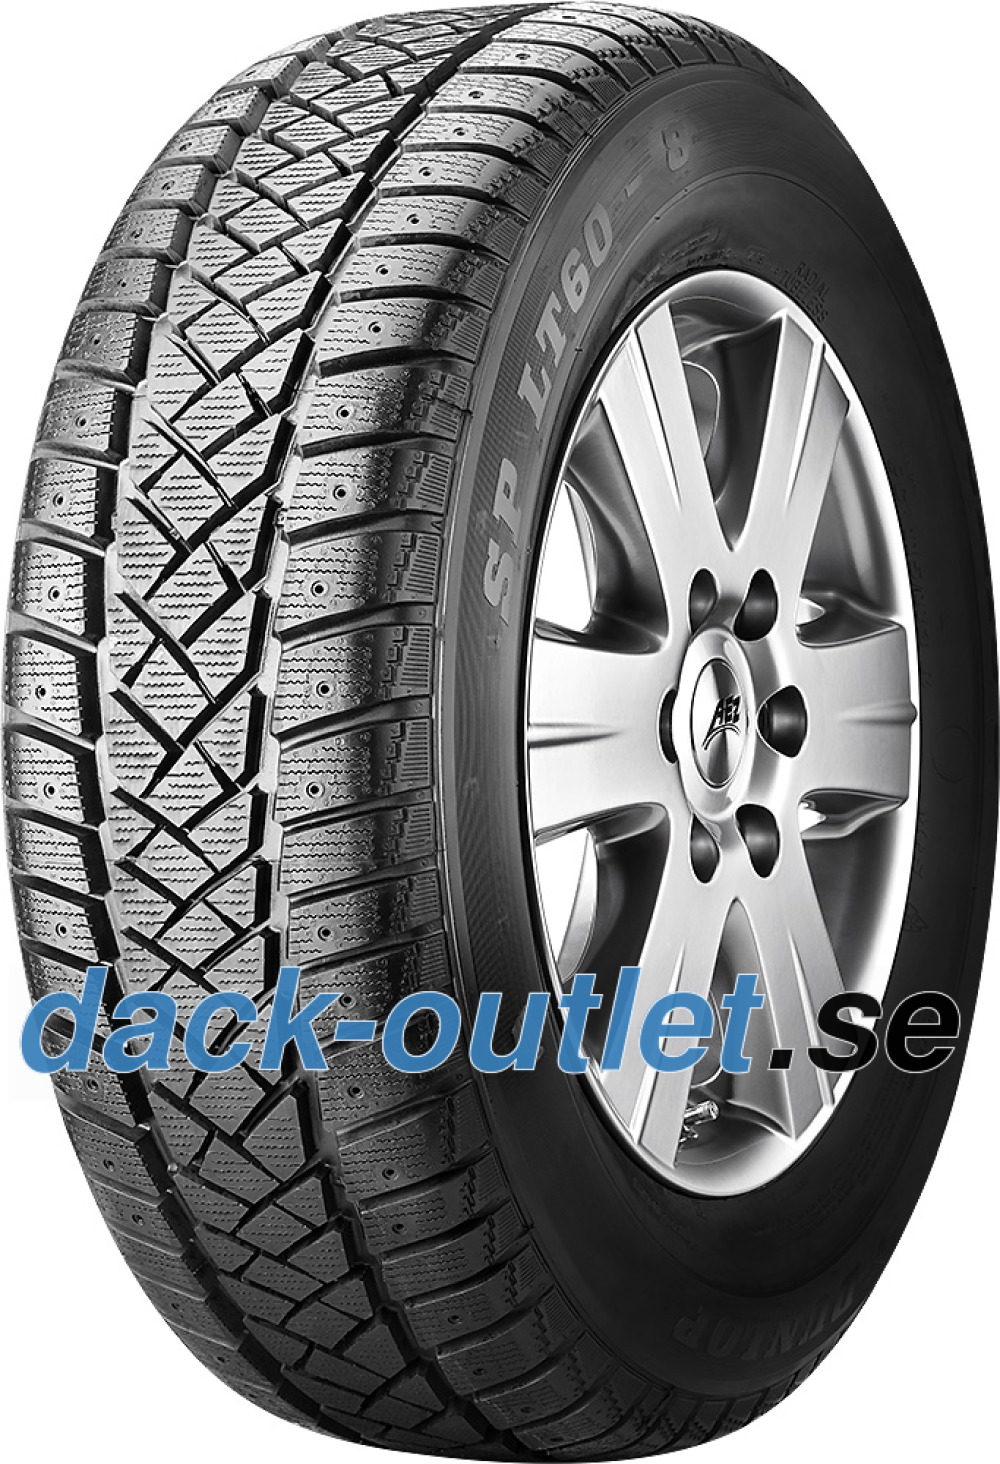 Dunlop SP LT 60 ( 195/65 R16C 104/102R 8PR , Kan dubbas  )